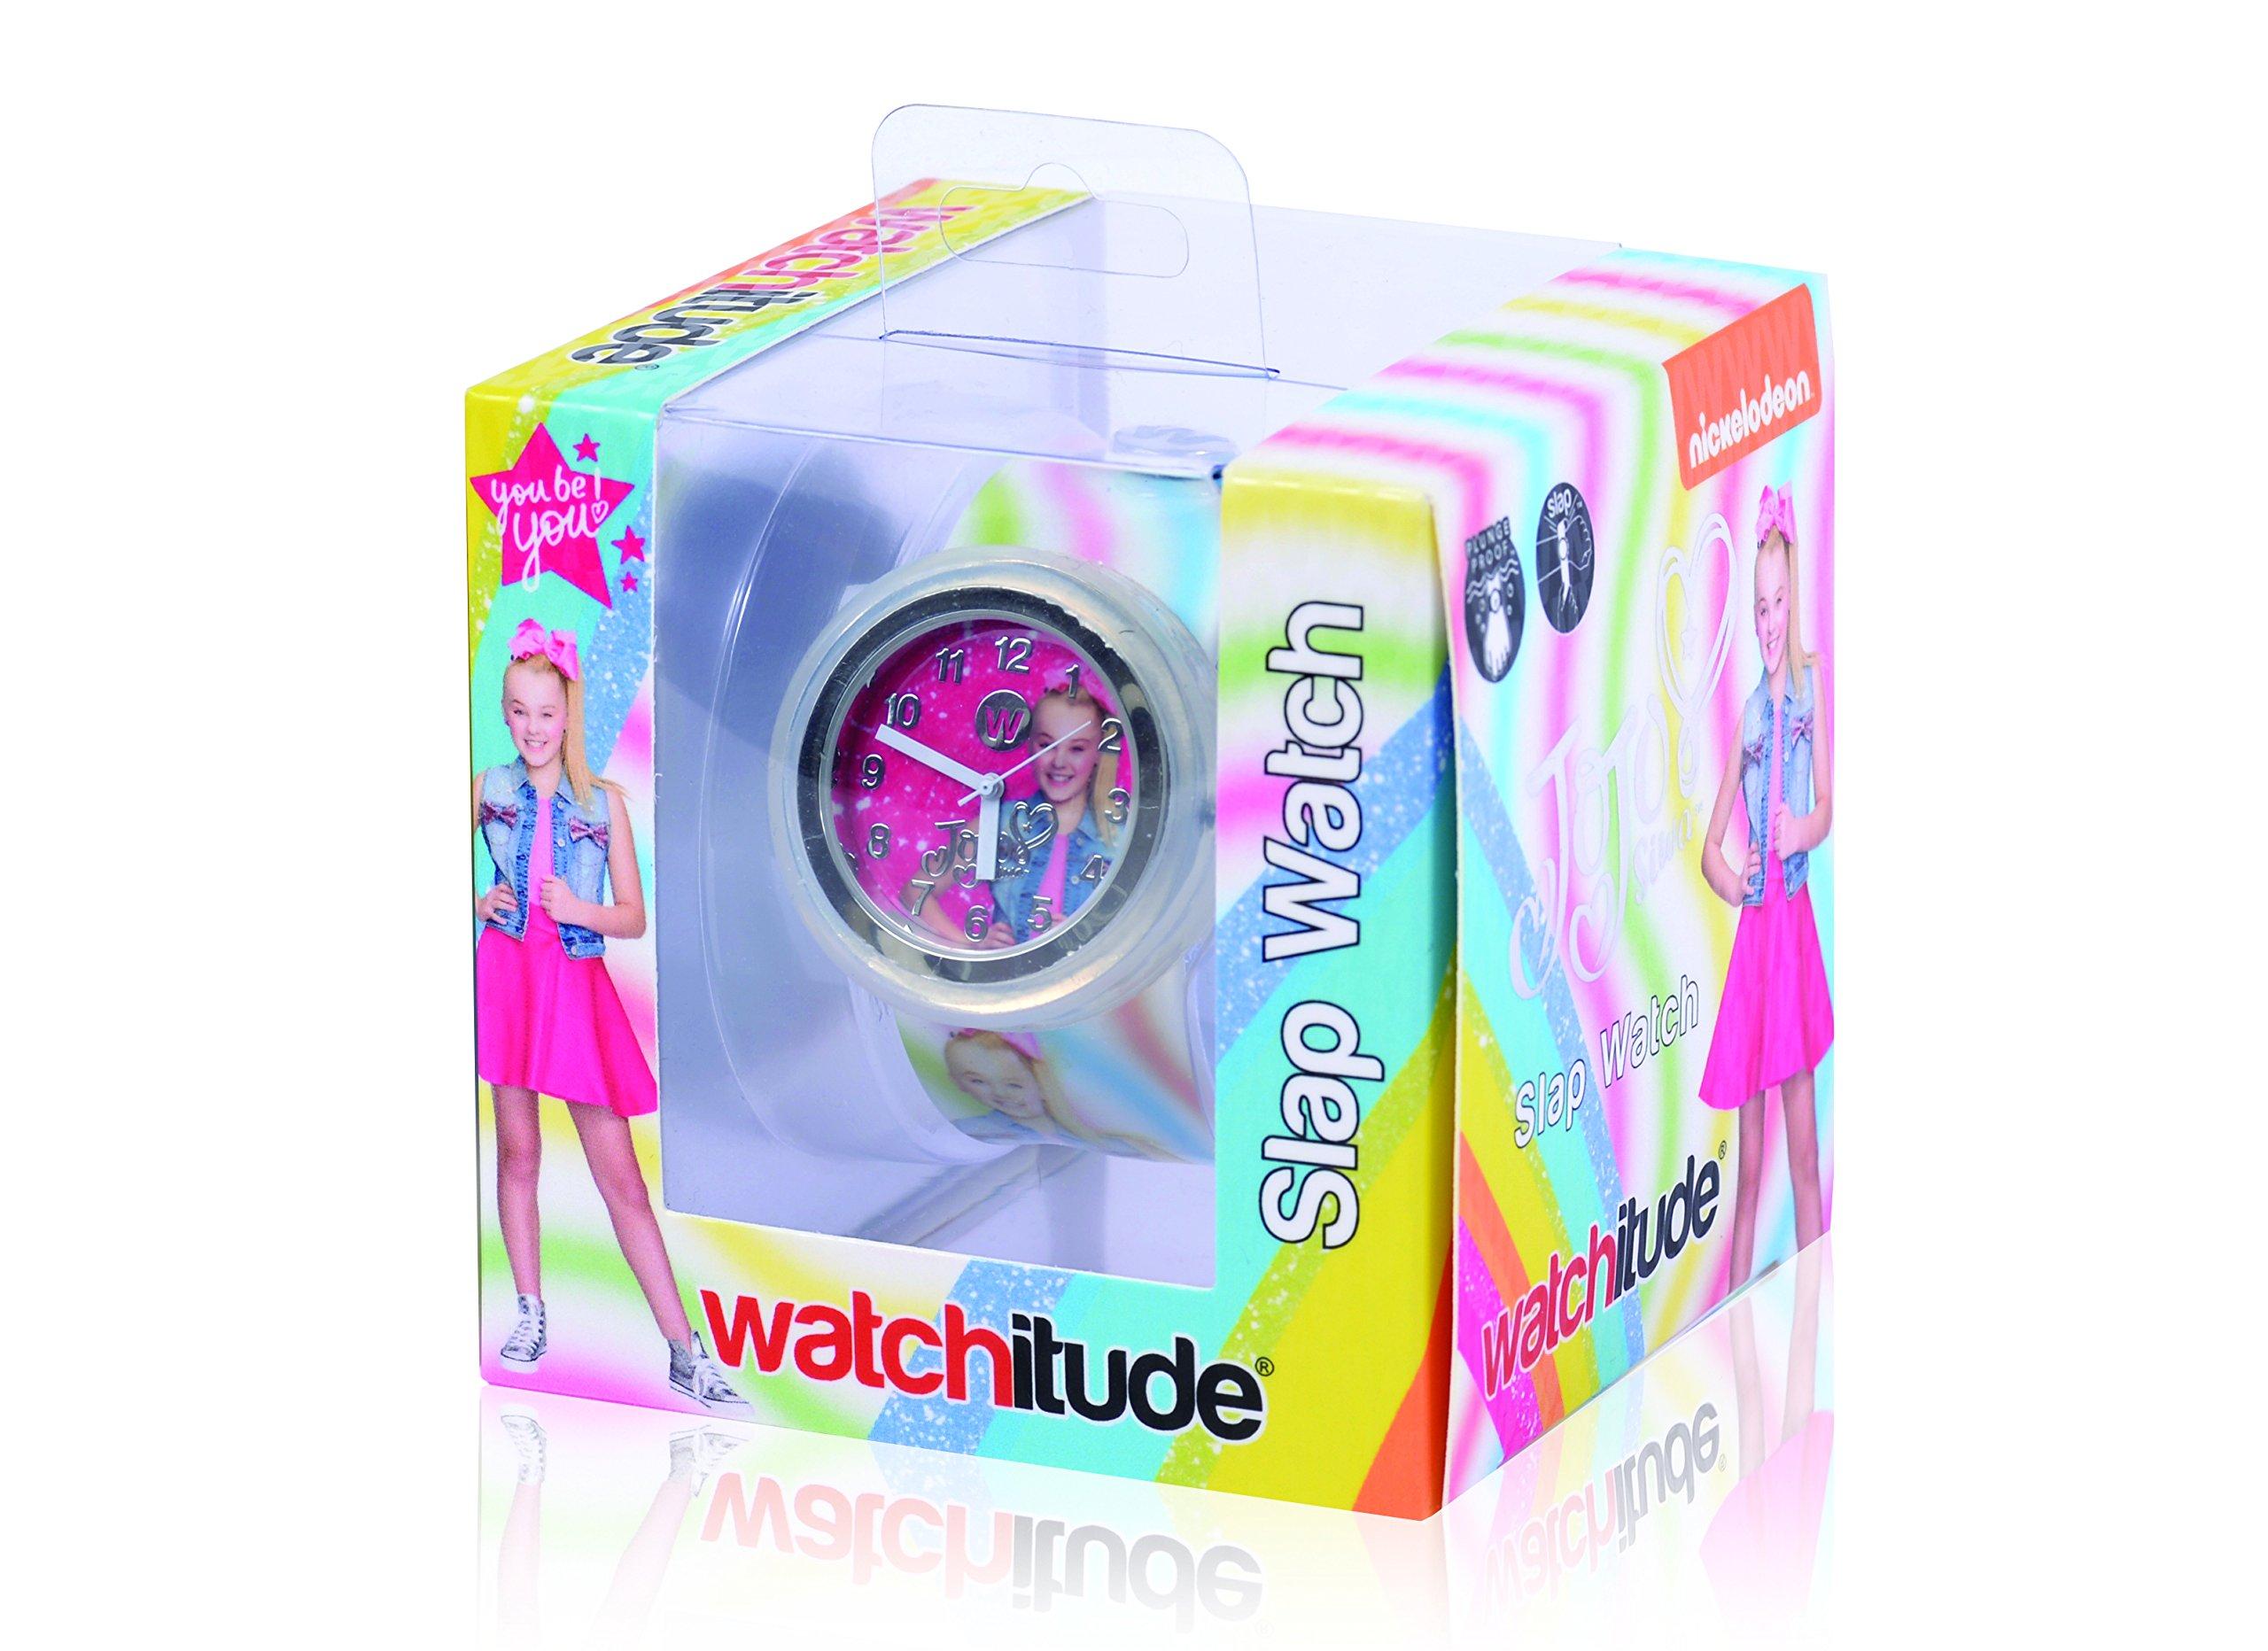 JoJo Siwa - Watchitude Plunge Proof Slap Watch - You be You - Gift Box Edition